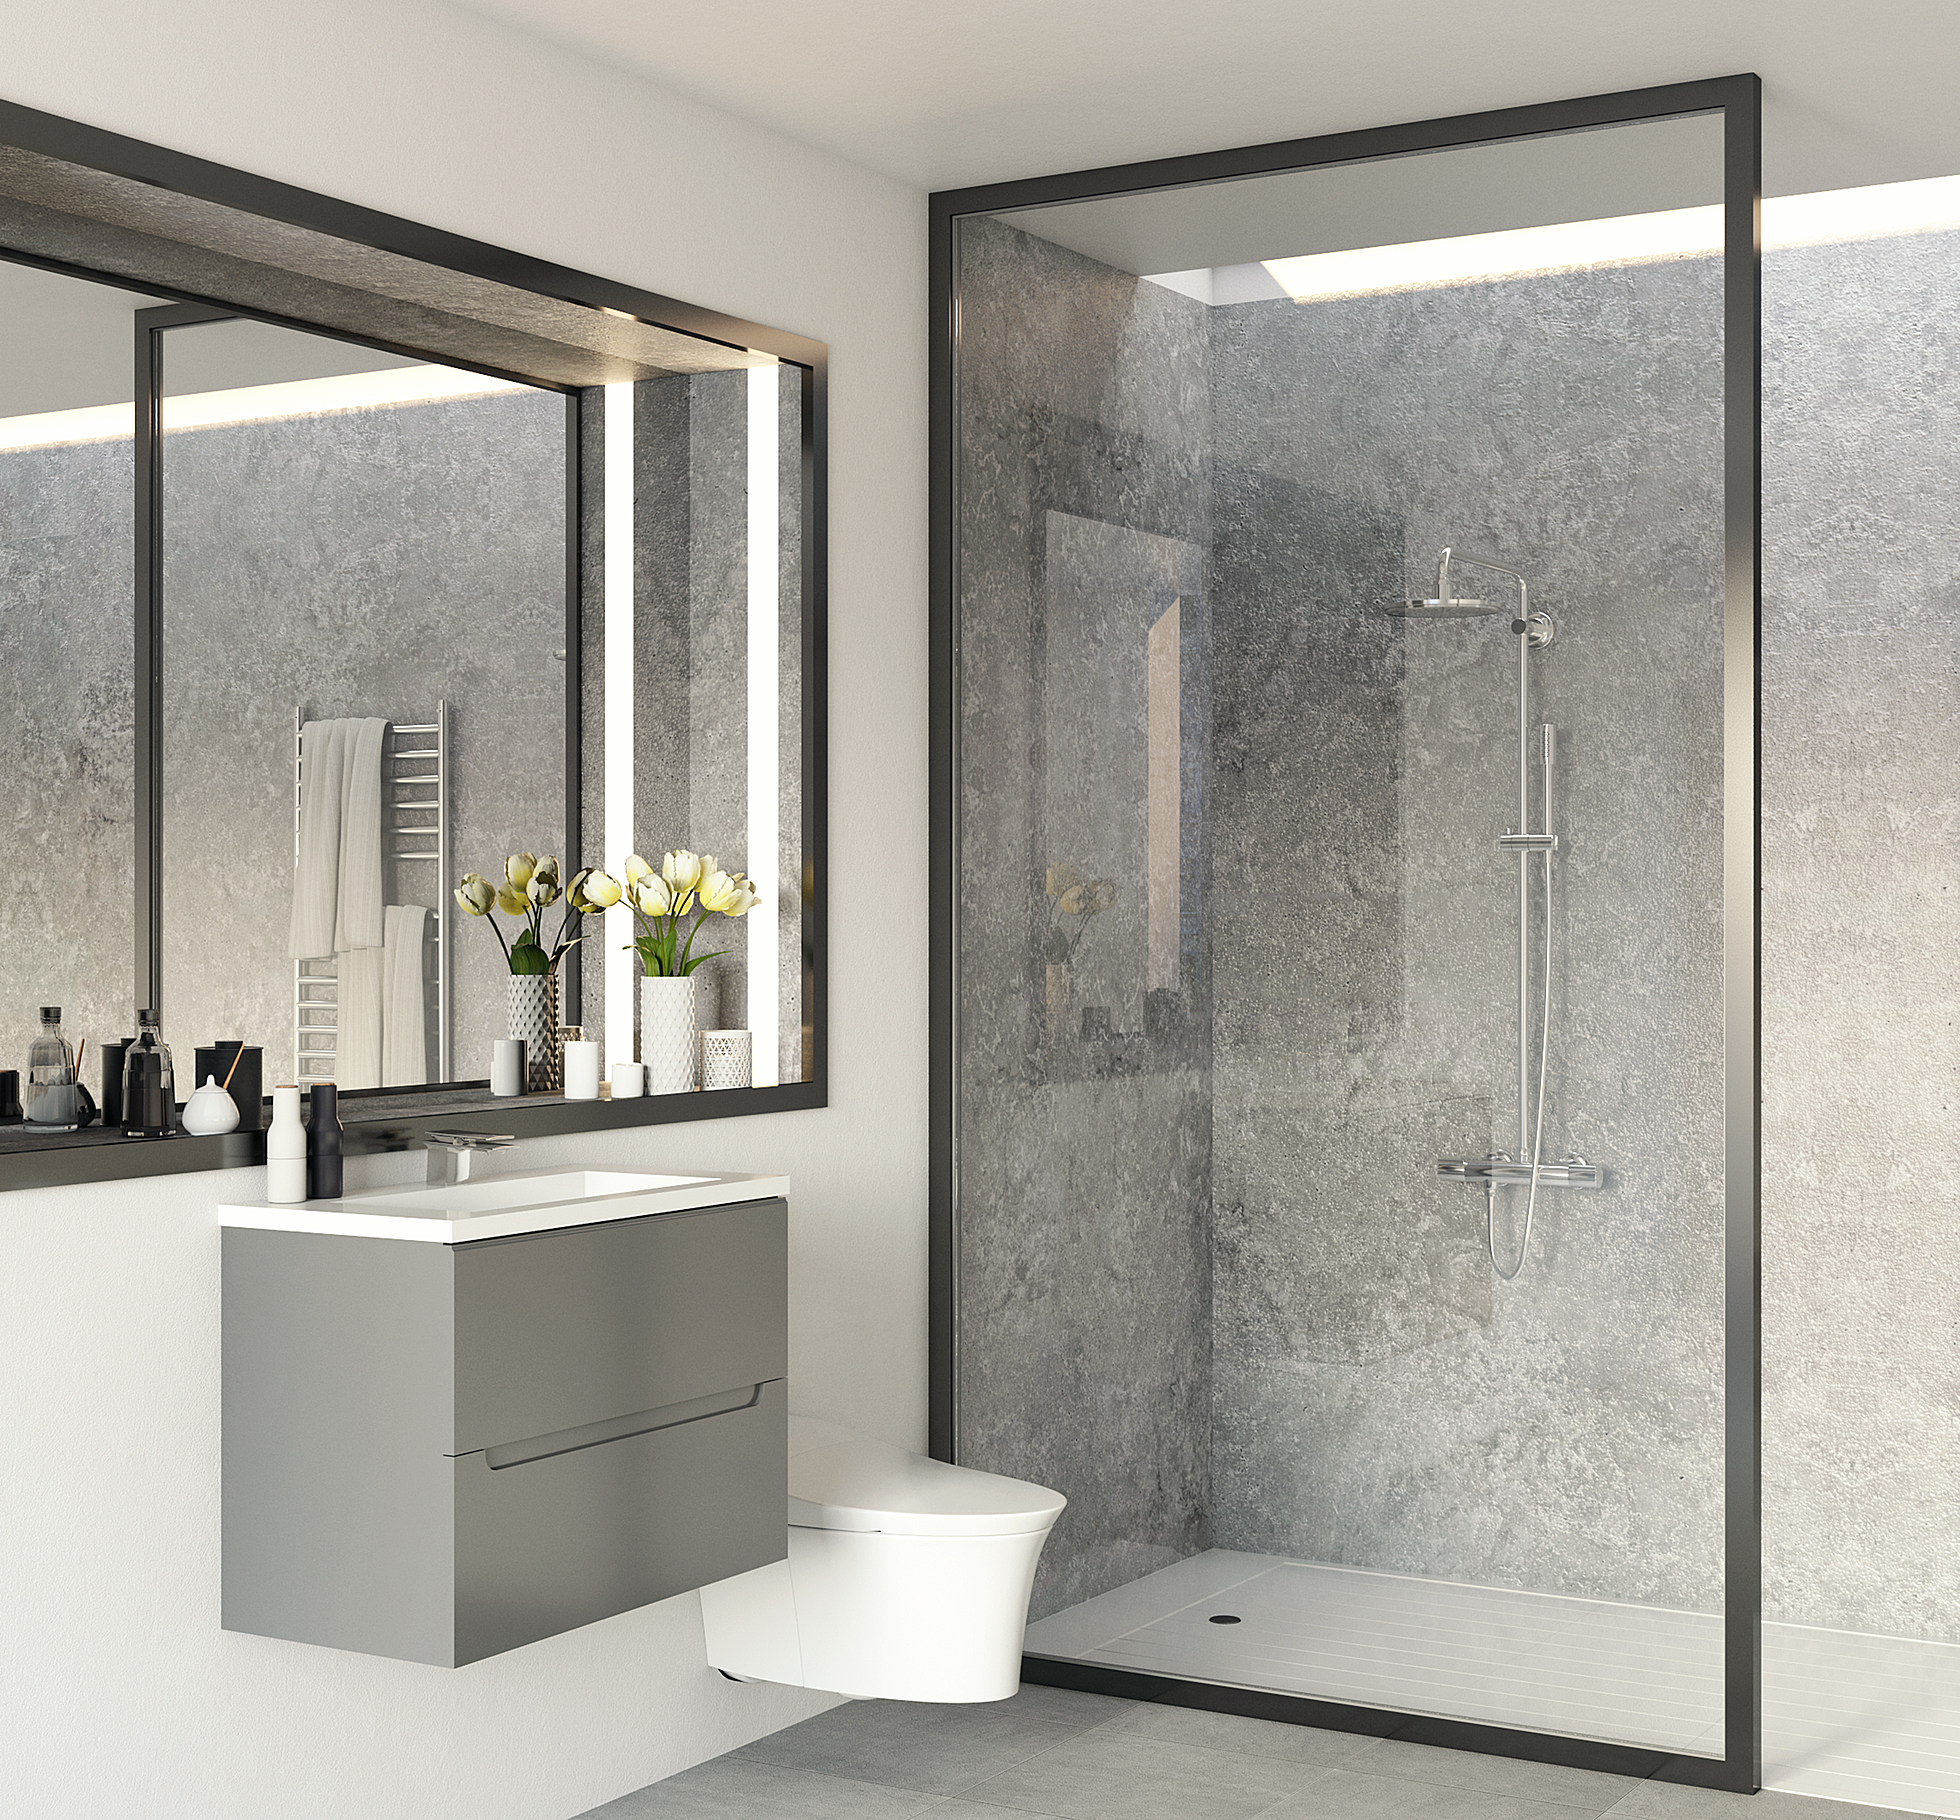 Bathroom Specialists Mr Wet Wall Australia Grout Free Wet Areas Bathroom Wall Panels Glass Shower Wall Bathroom Wet Wall